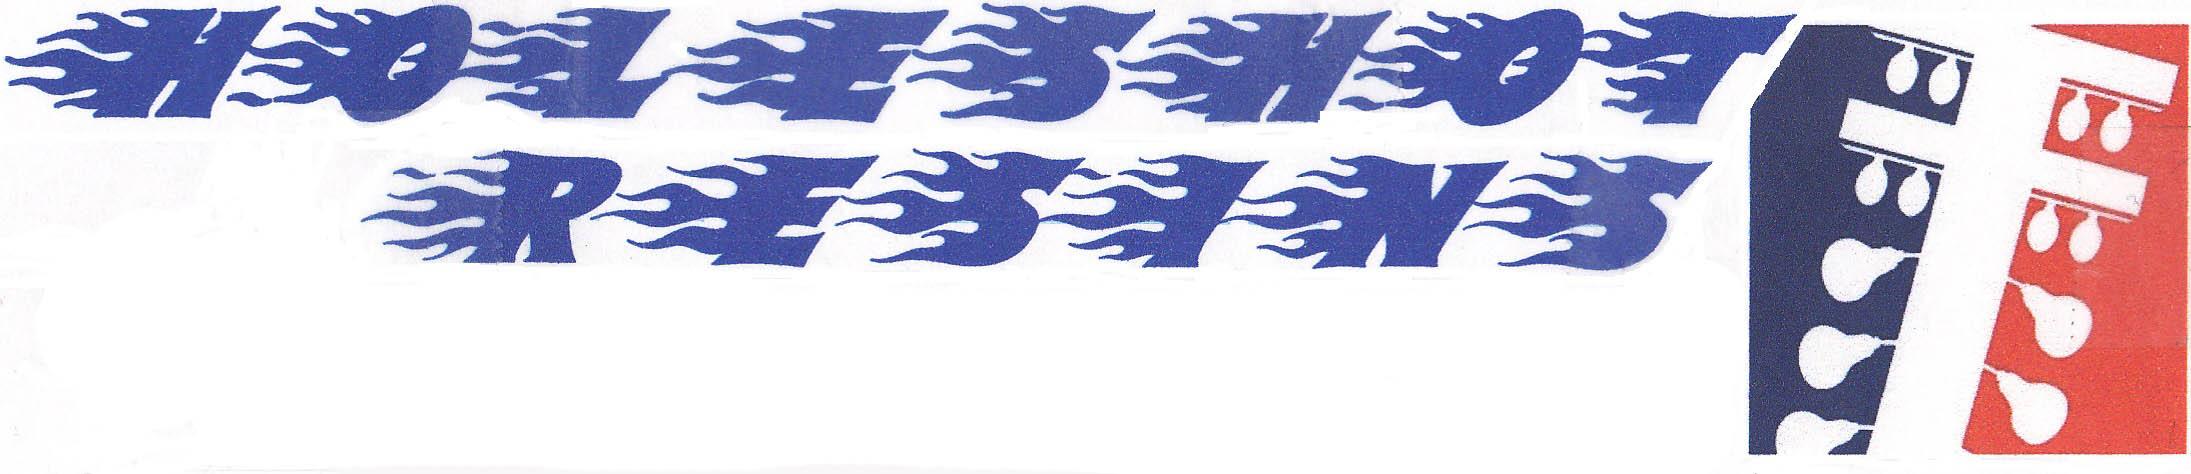 holeshot-bare-logo.jpg